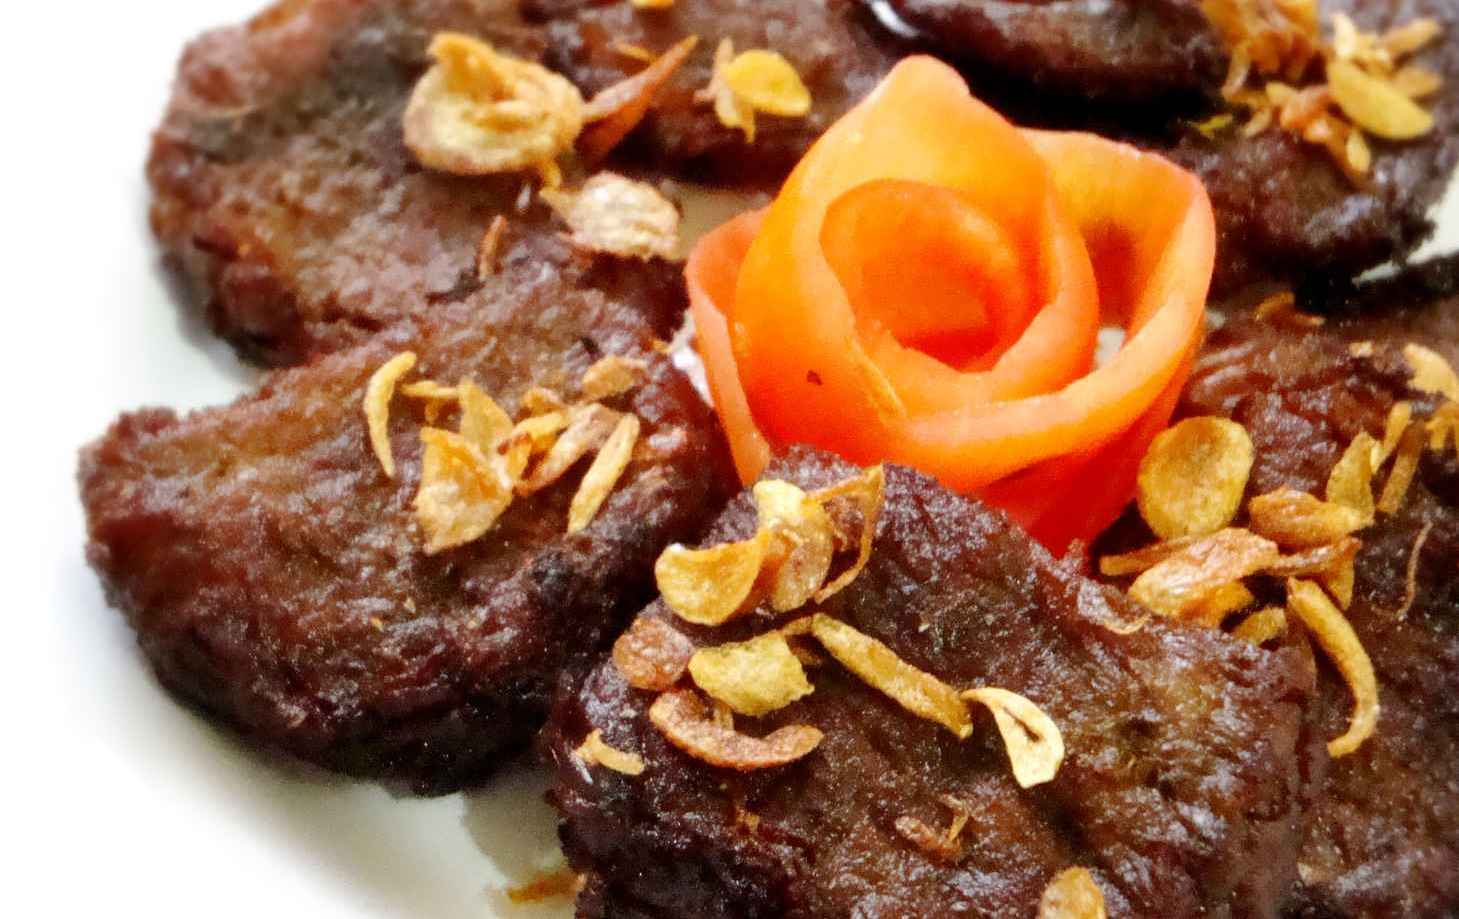 Resep+empal+daging+sapi+empuk+Paling+Enak